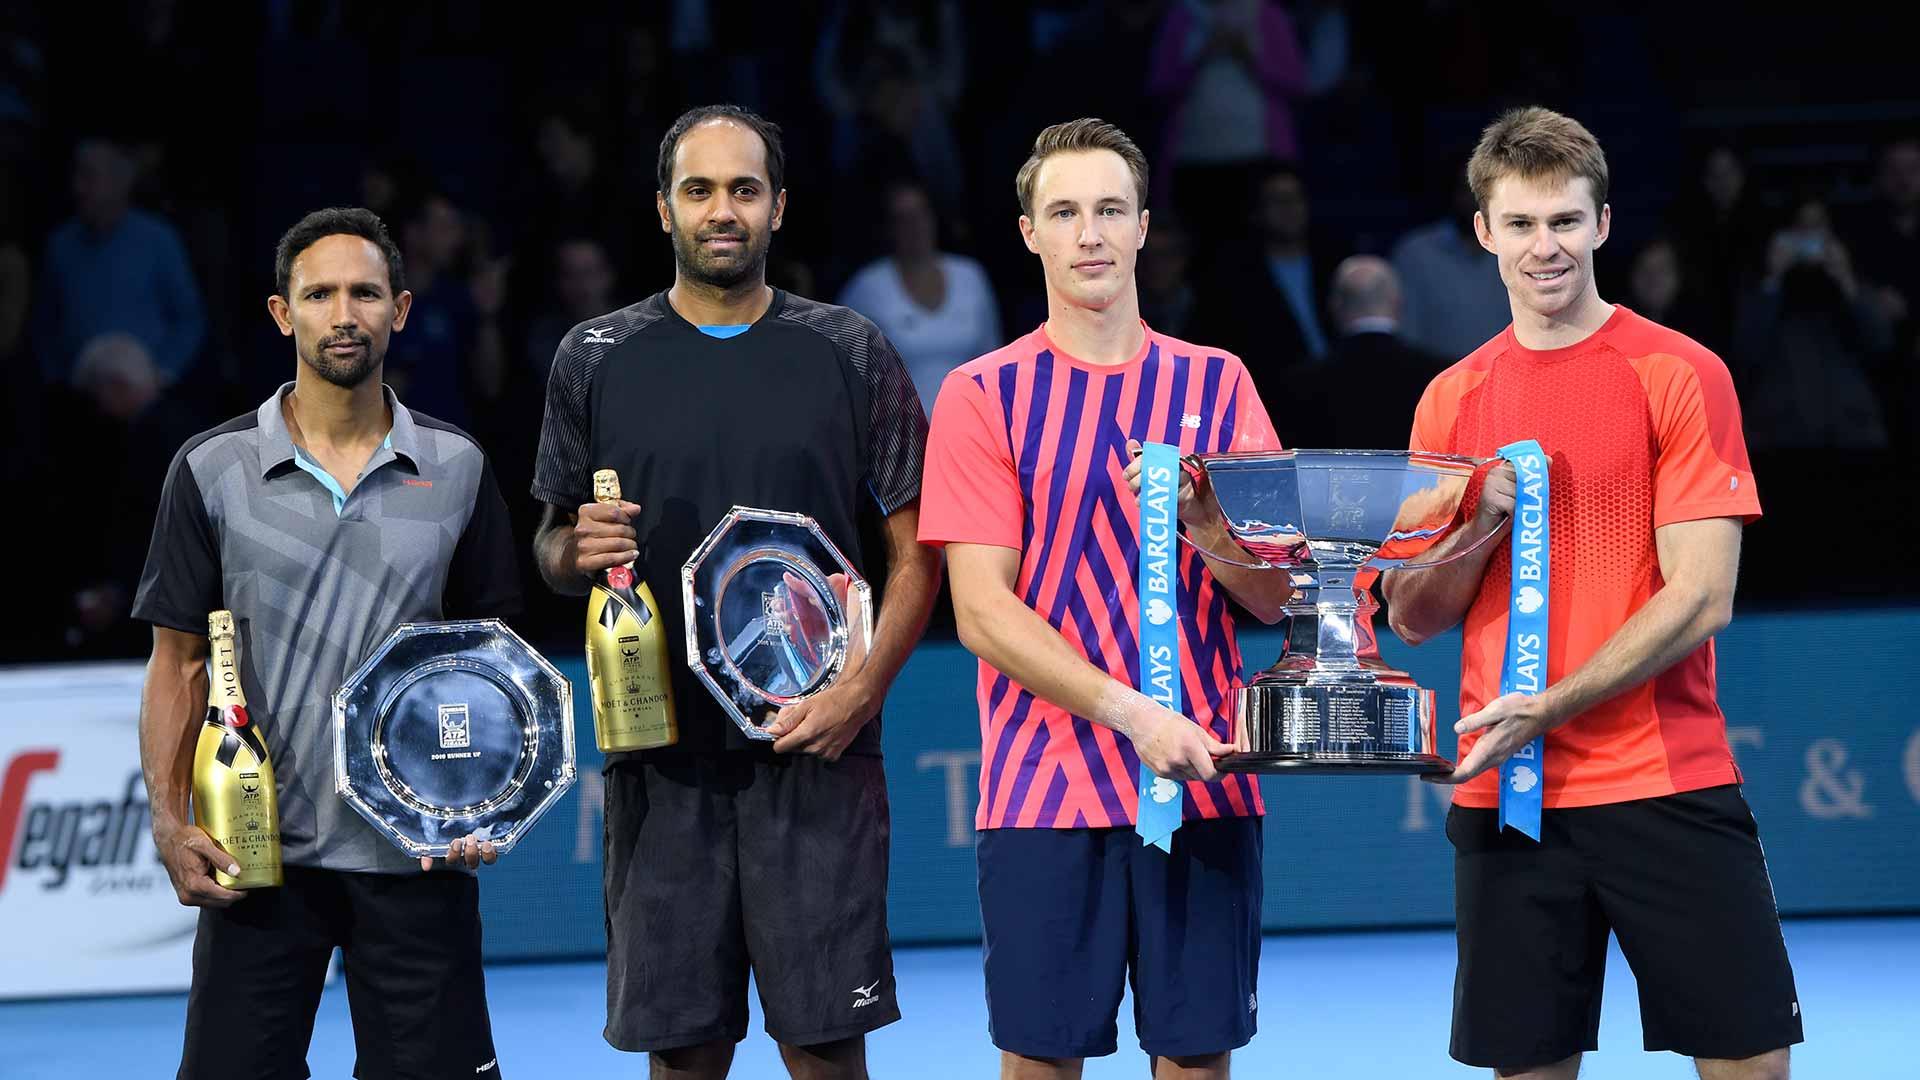 Kontinen/Peers Beat Klaasen/Ram, Deliver A Perfect 10 To End Season | Nitto ATP Finals